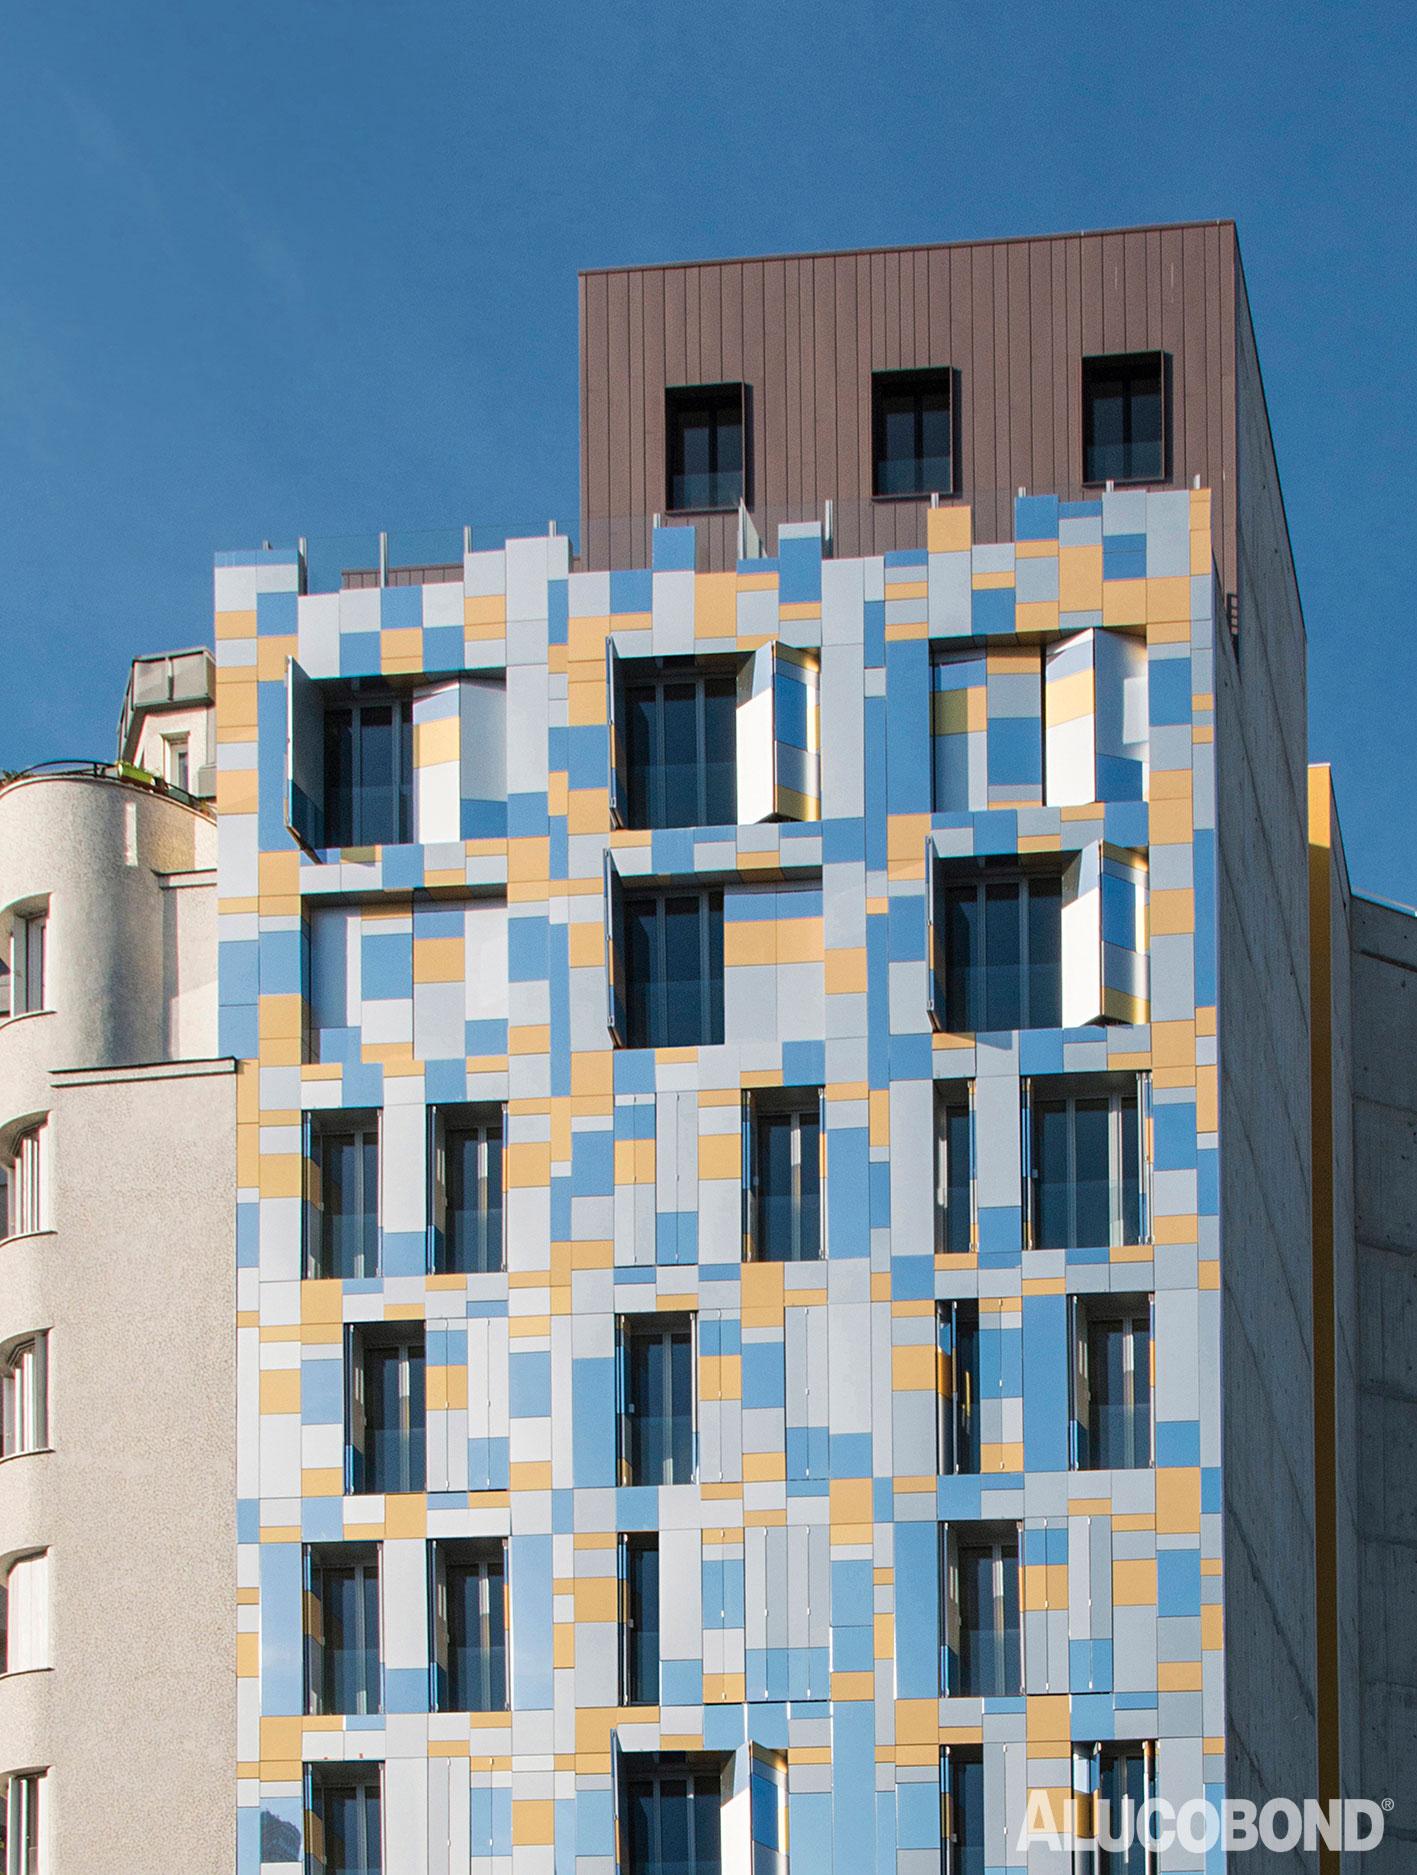 Responsive Facades, Alucobond, Quai de Charente, Margot Duclot Architectes Associes, Manuel Panaget